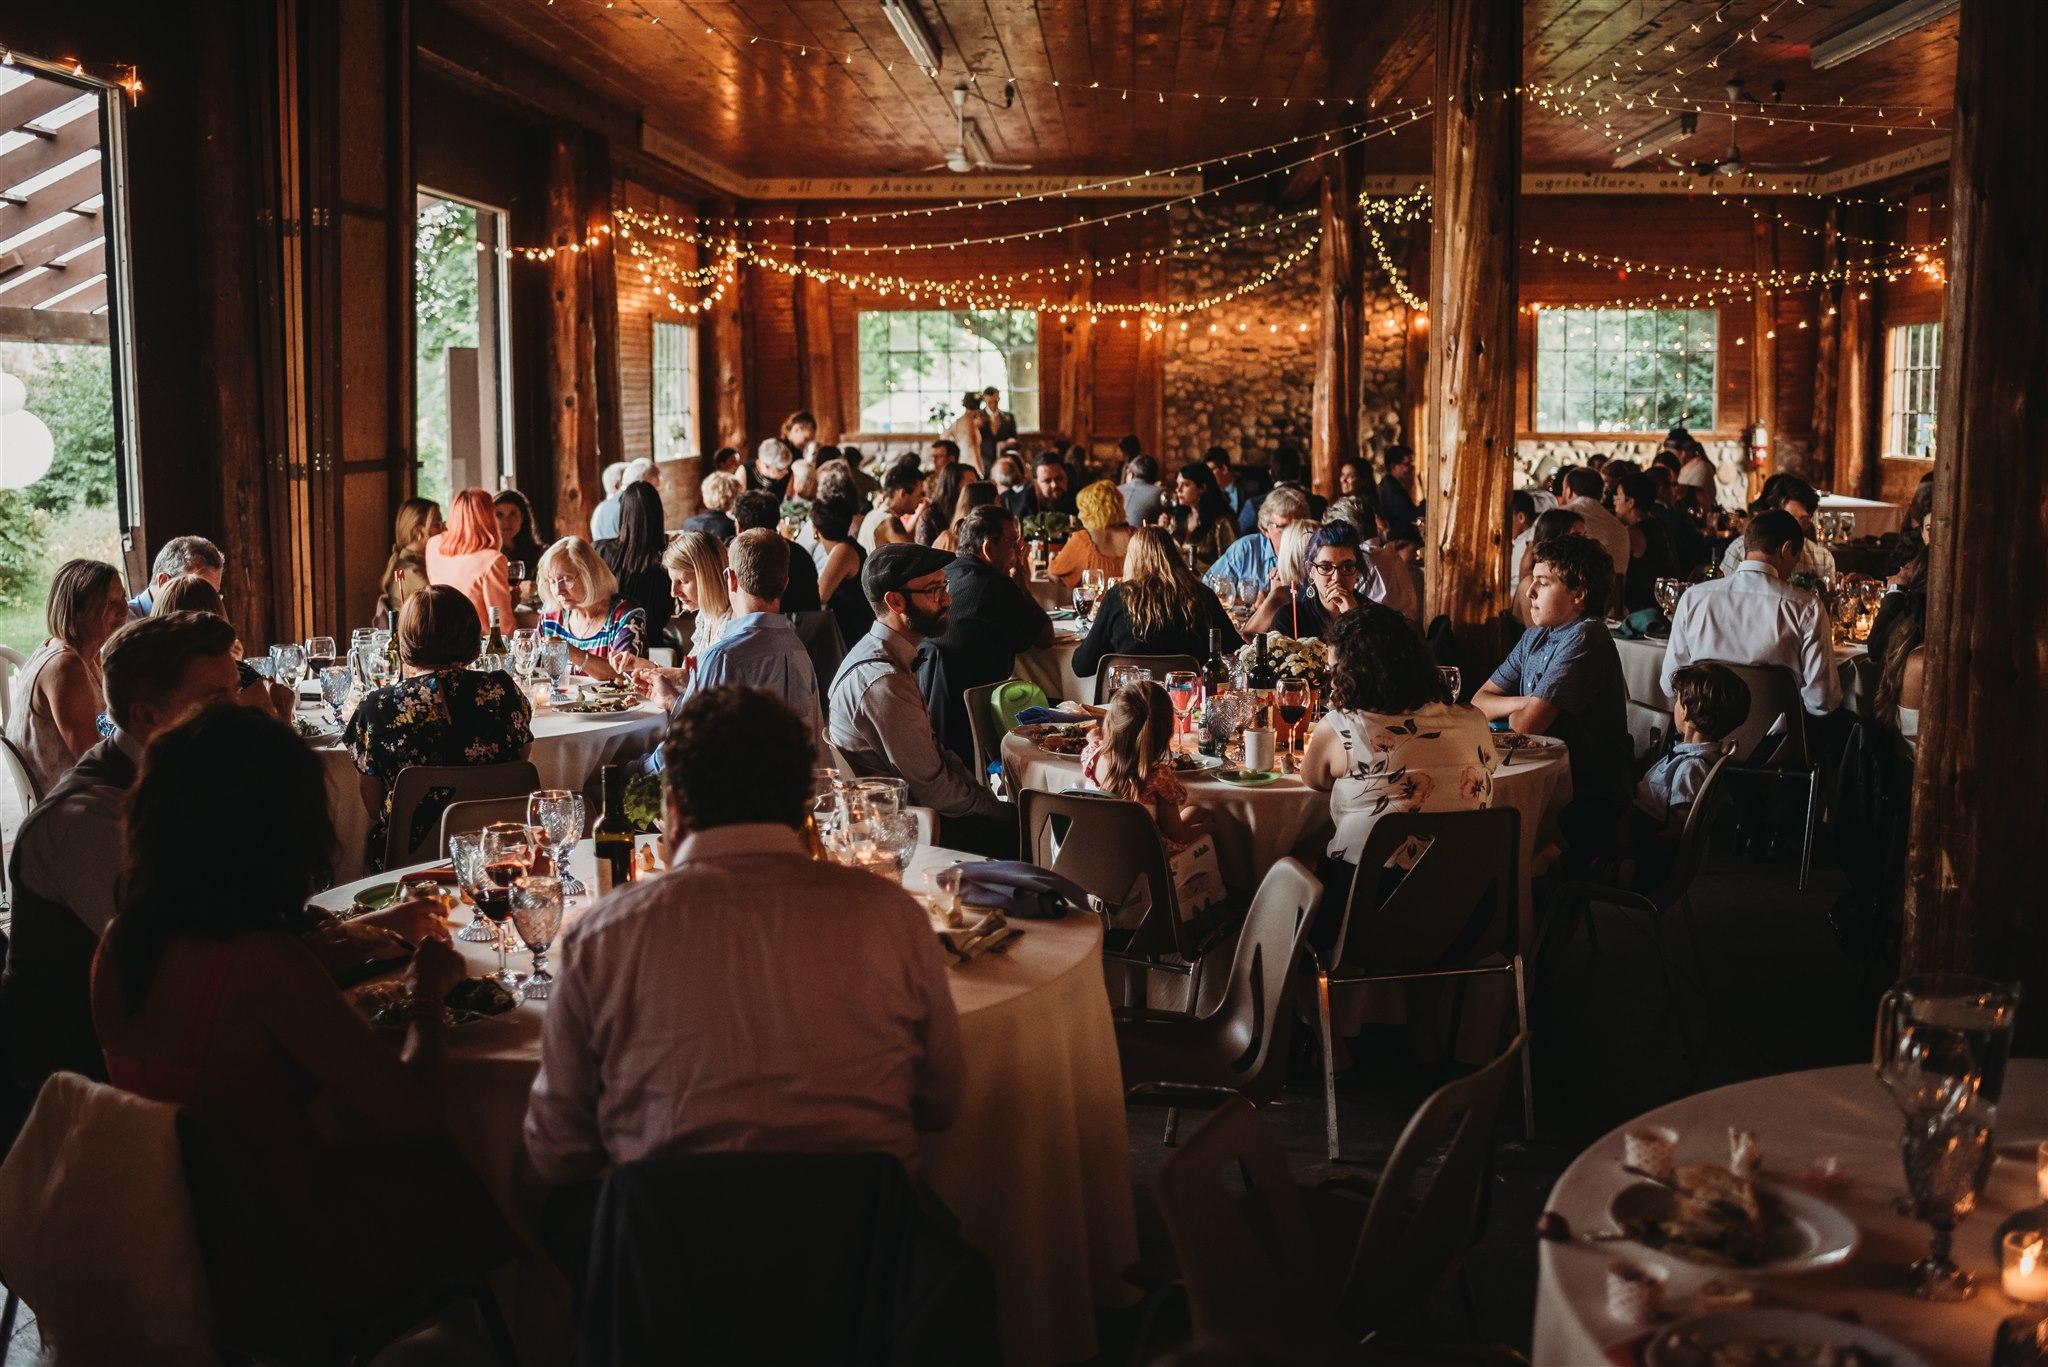 fanshawe conservation area wedding photos 475 1 - Watson Porter Pavillion Wedding